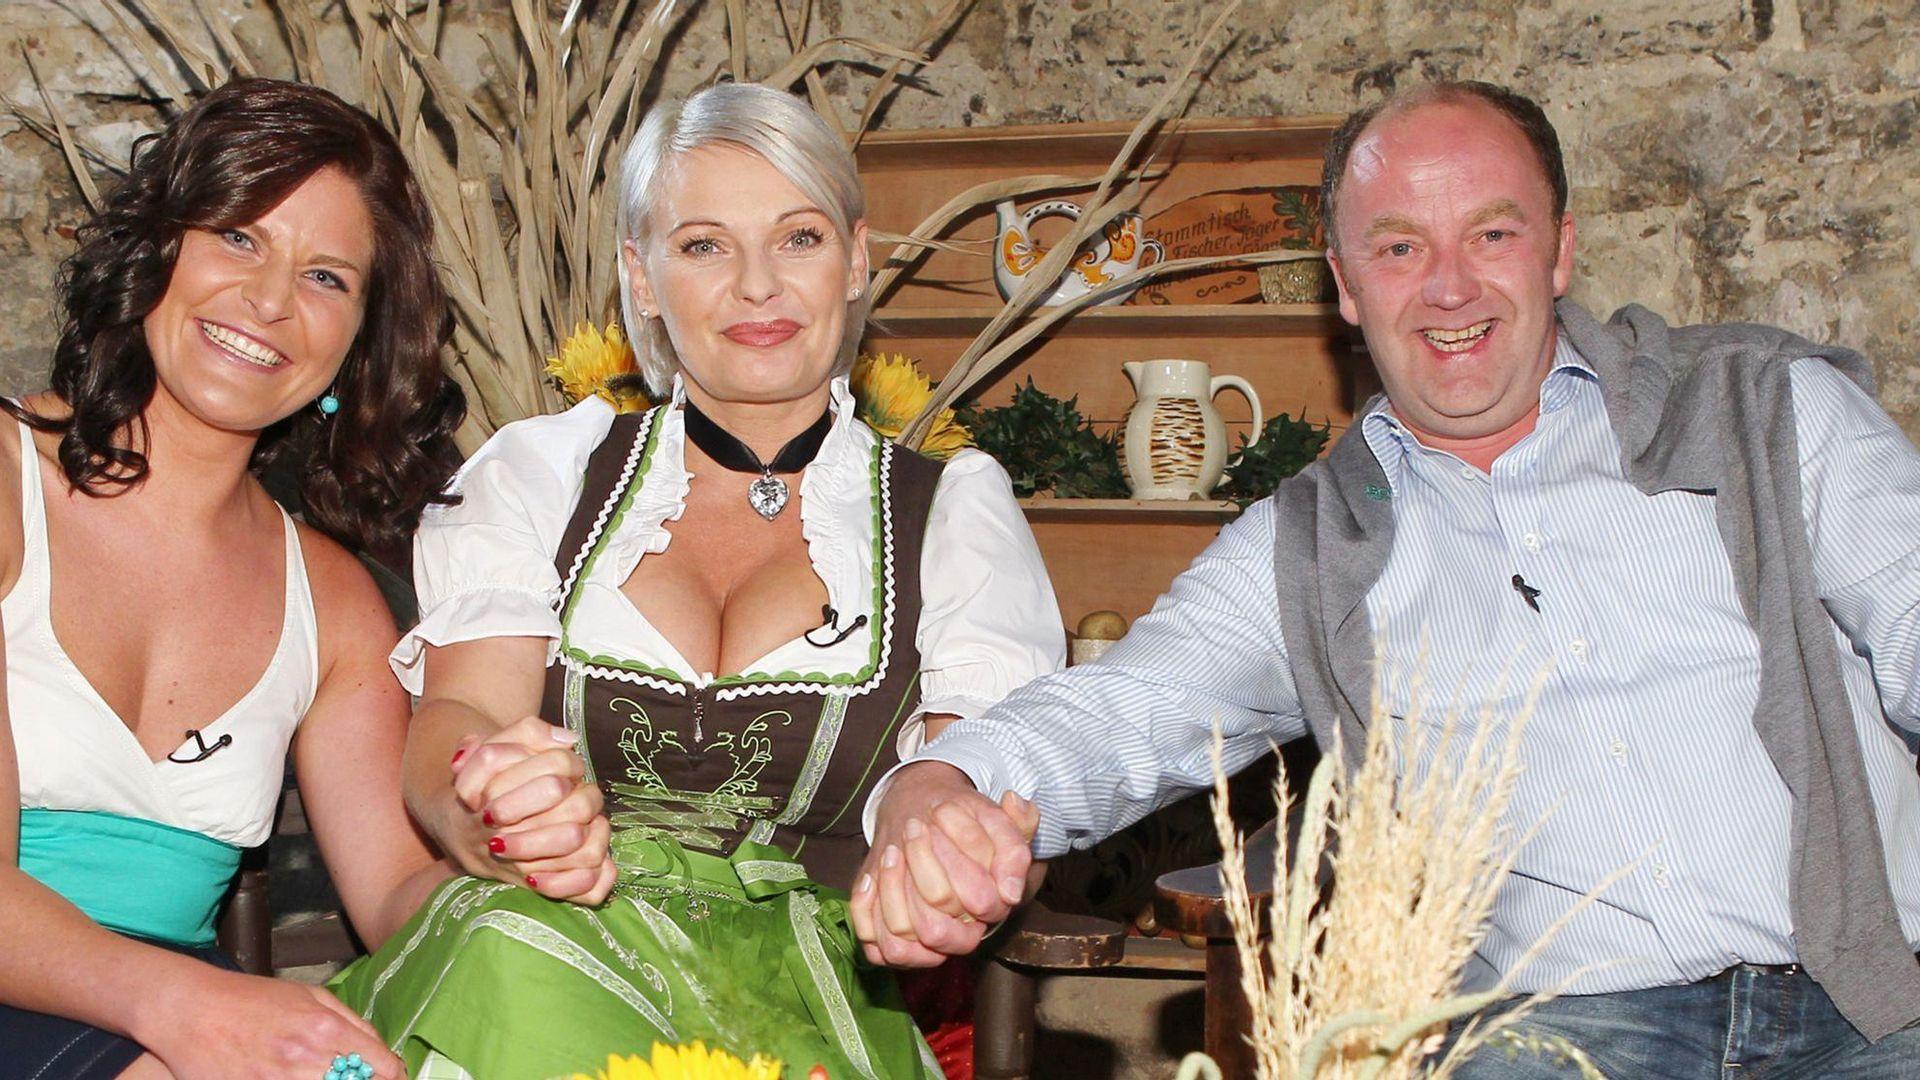 Bauer Sucht Frau 2012